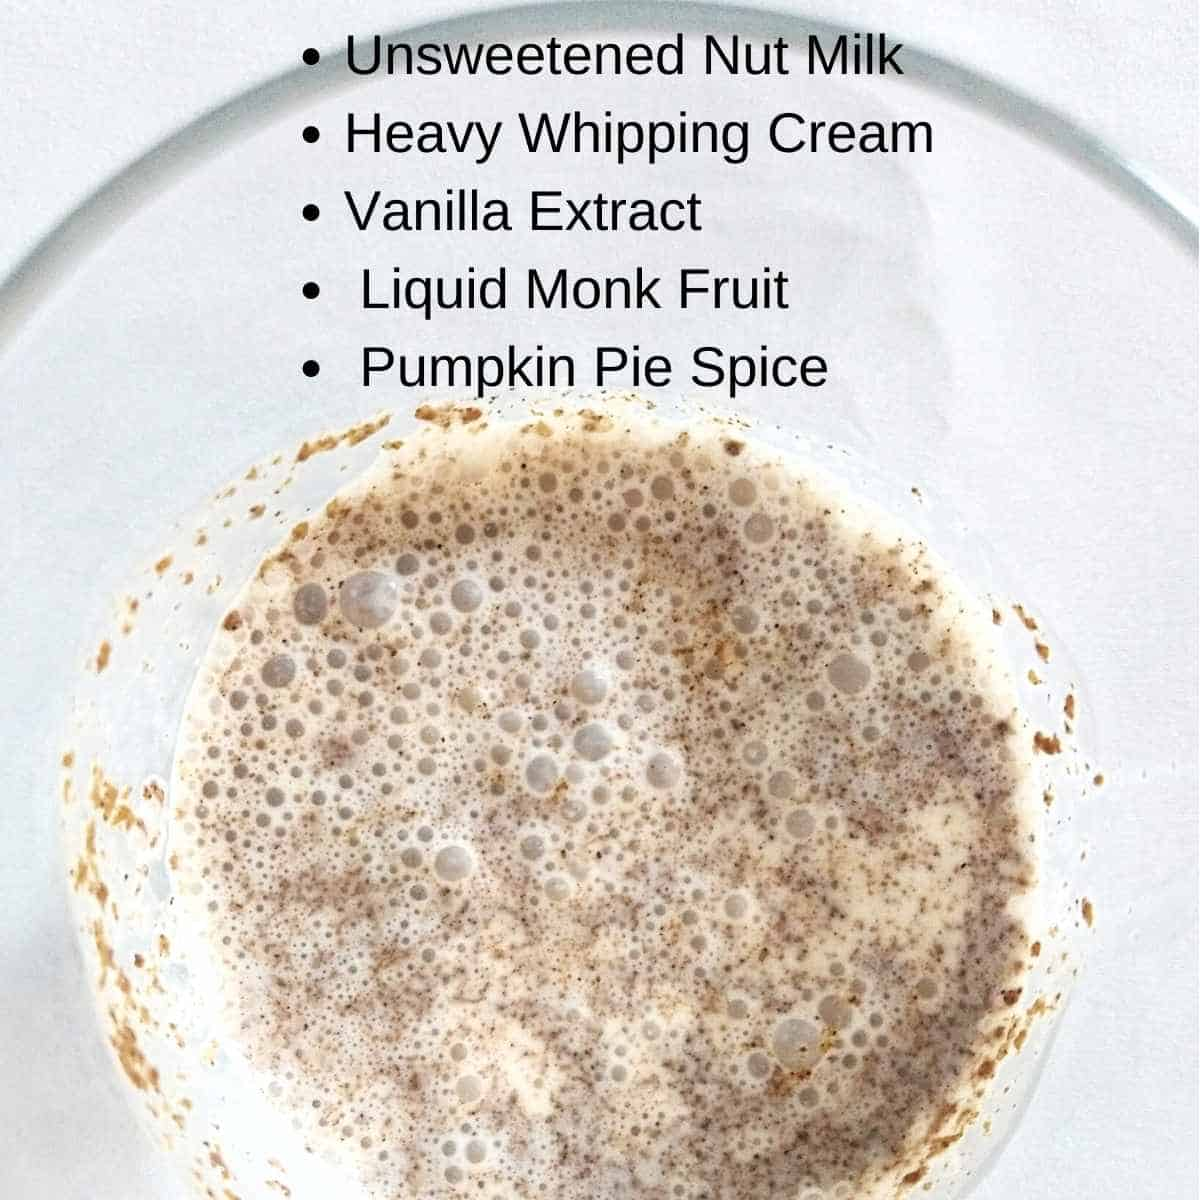 ingredients for pumpkin cold foam - Keto Pumpkin Cold Foam: Info from a former Starbuck's Barista